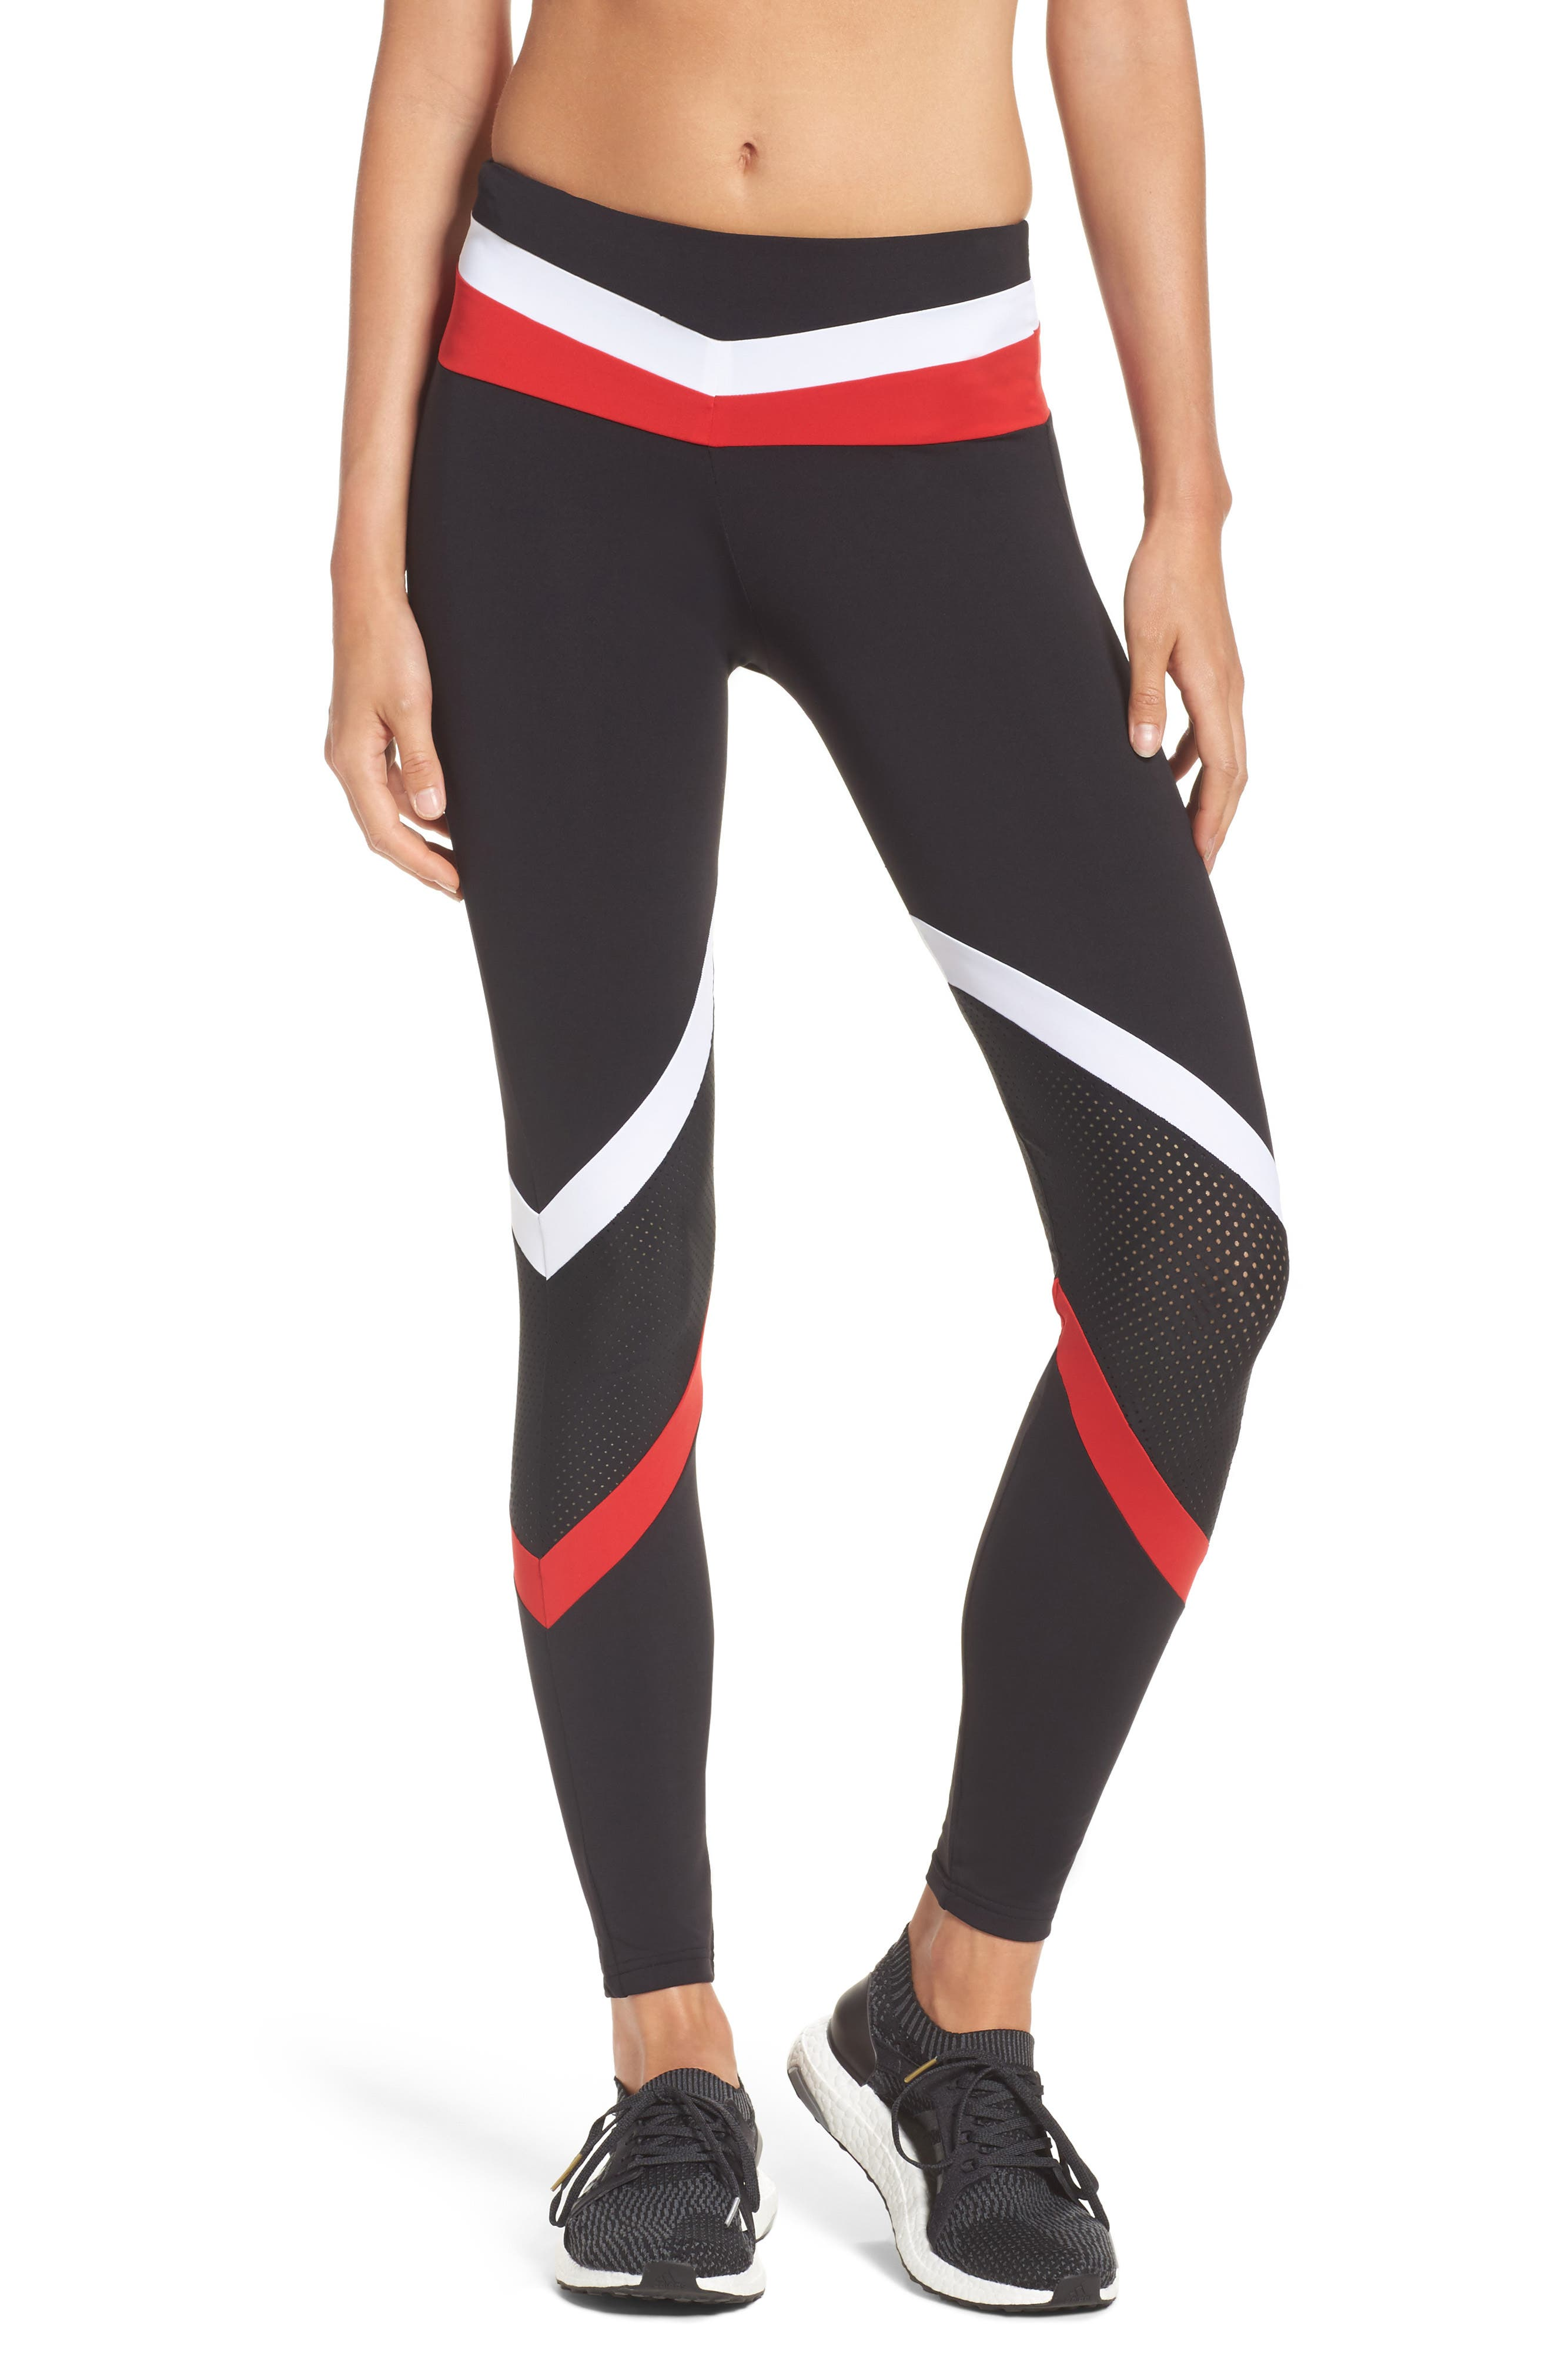 BoomBoom Athletica Leggings,                             Main thumbnail 1, color,                             Black/ White/ Red